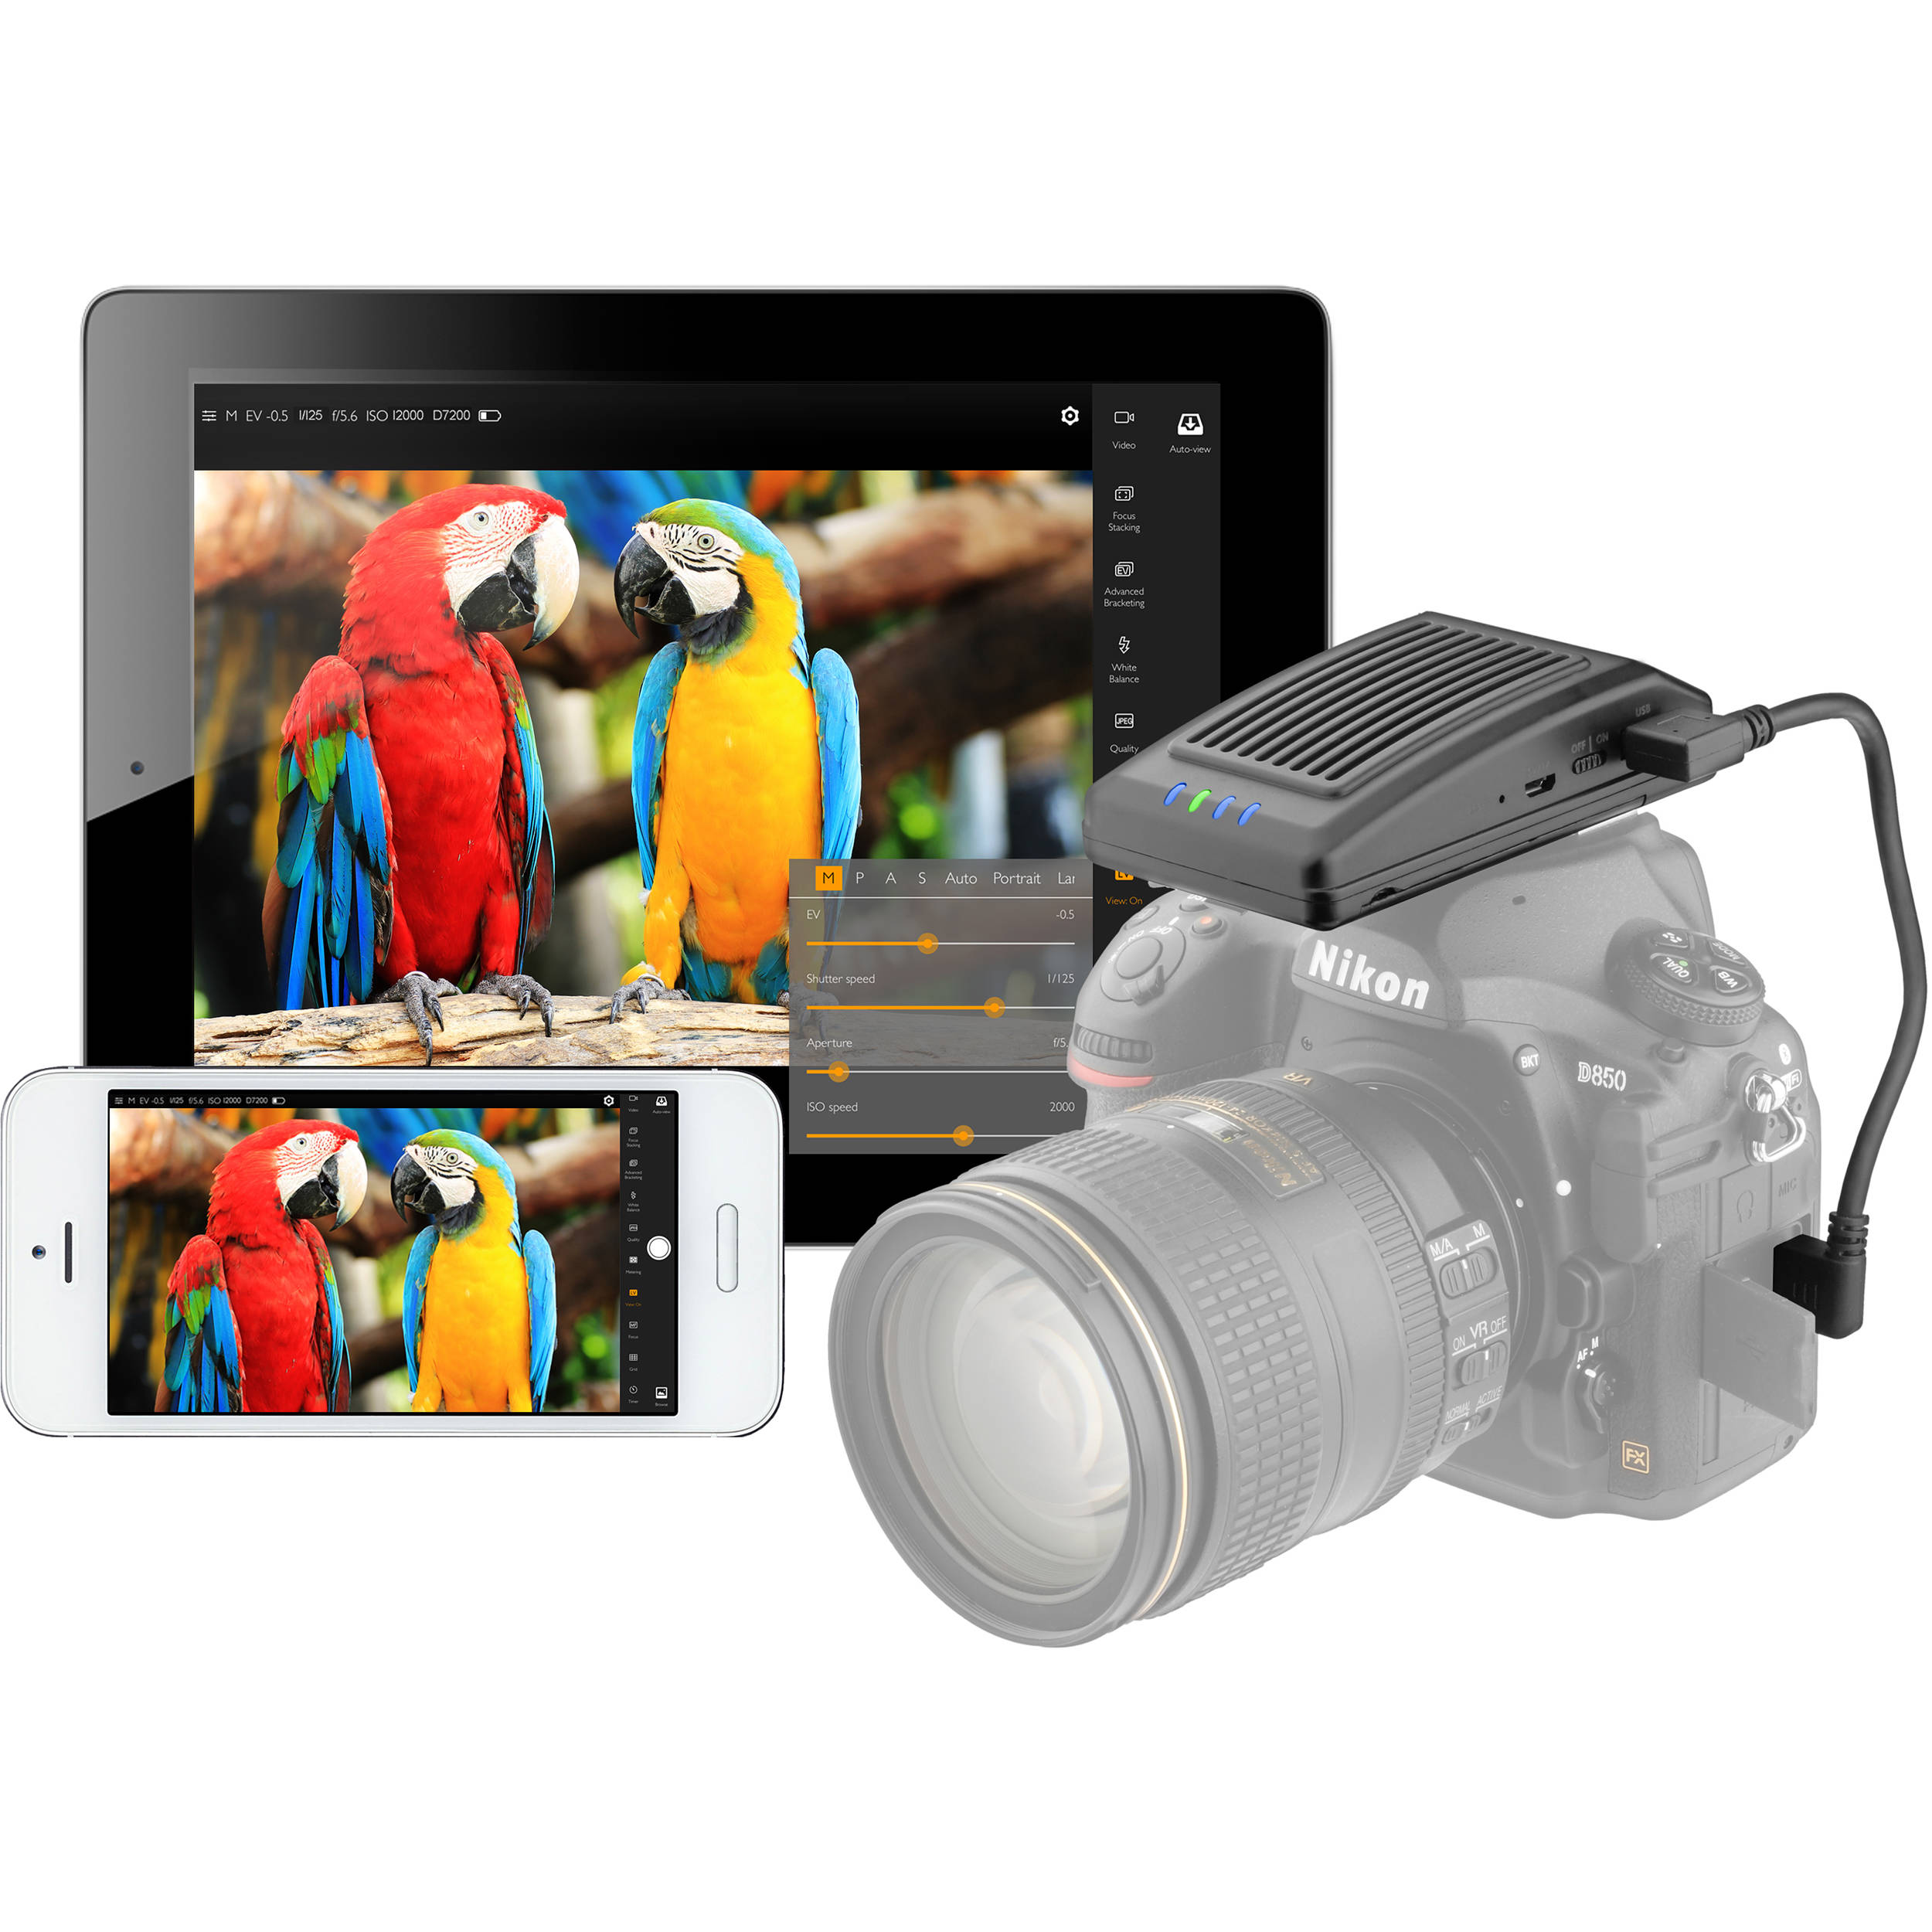 Vello LW-500 Extendá Plus Wi-Fi Camera Controller for Select Canon, Nikon,  and Sony Cameras